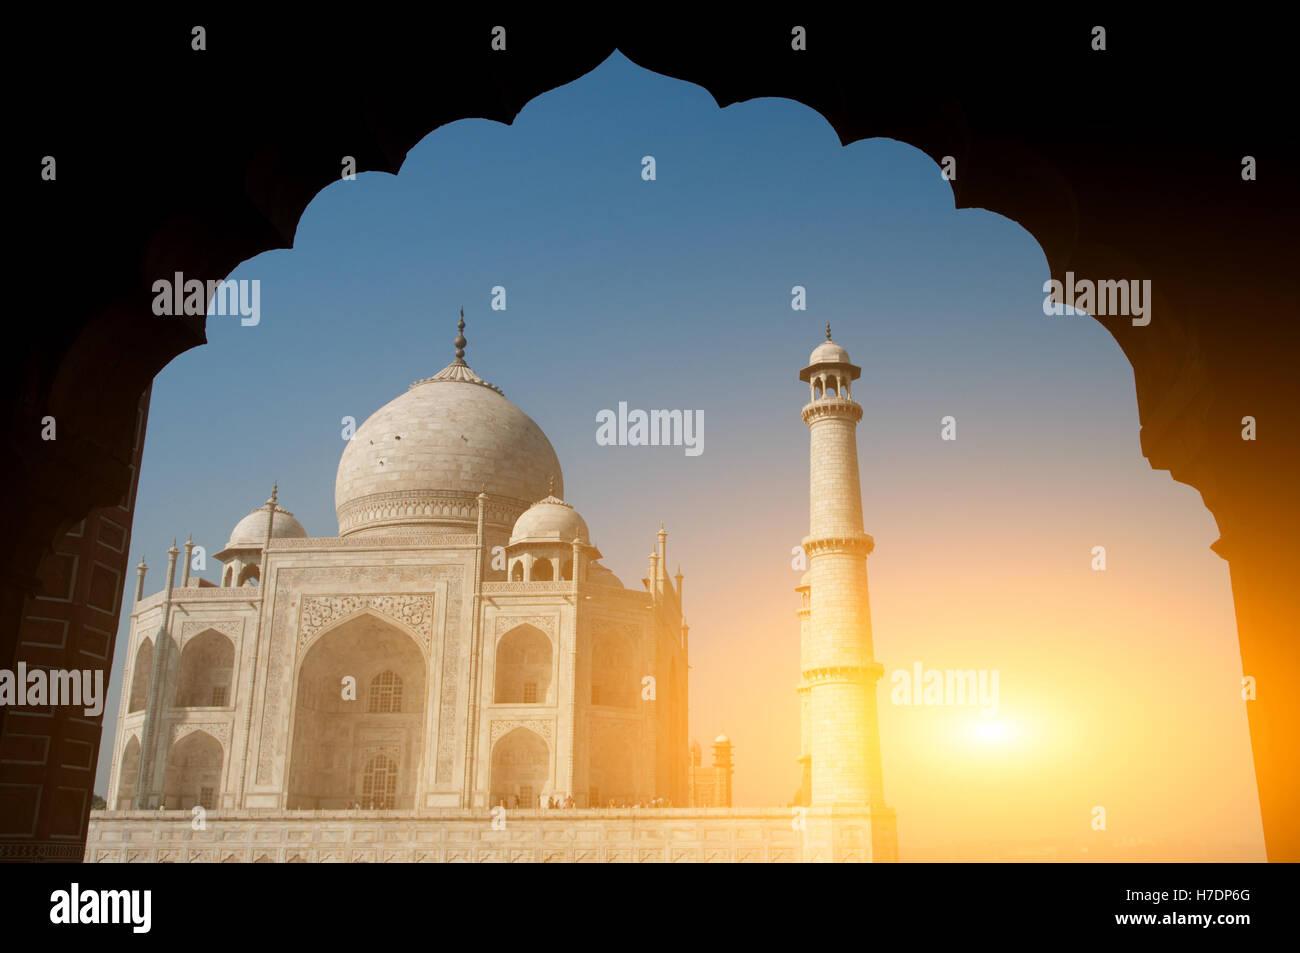 Taj Mahal archway view - Stock Image